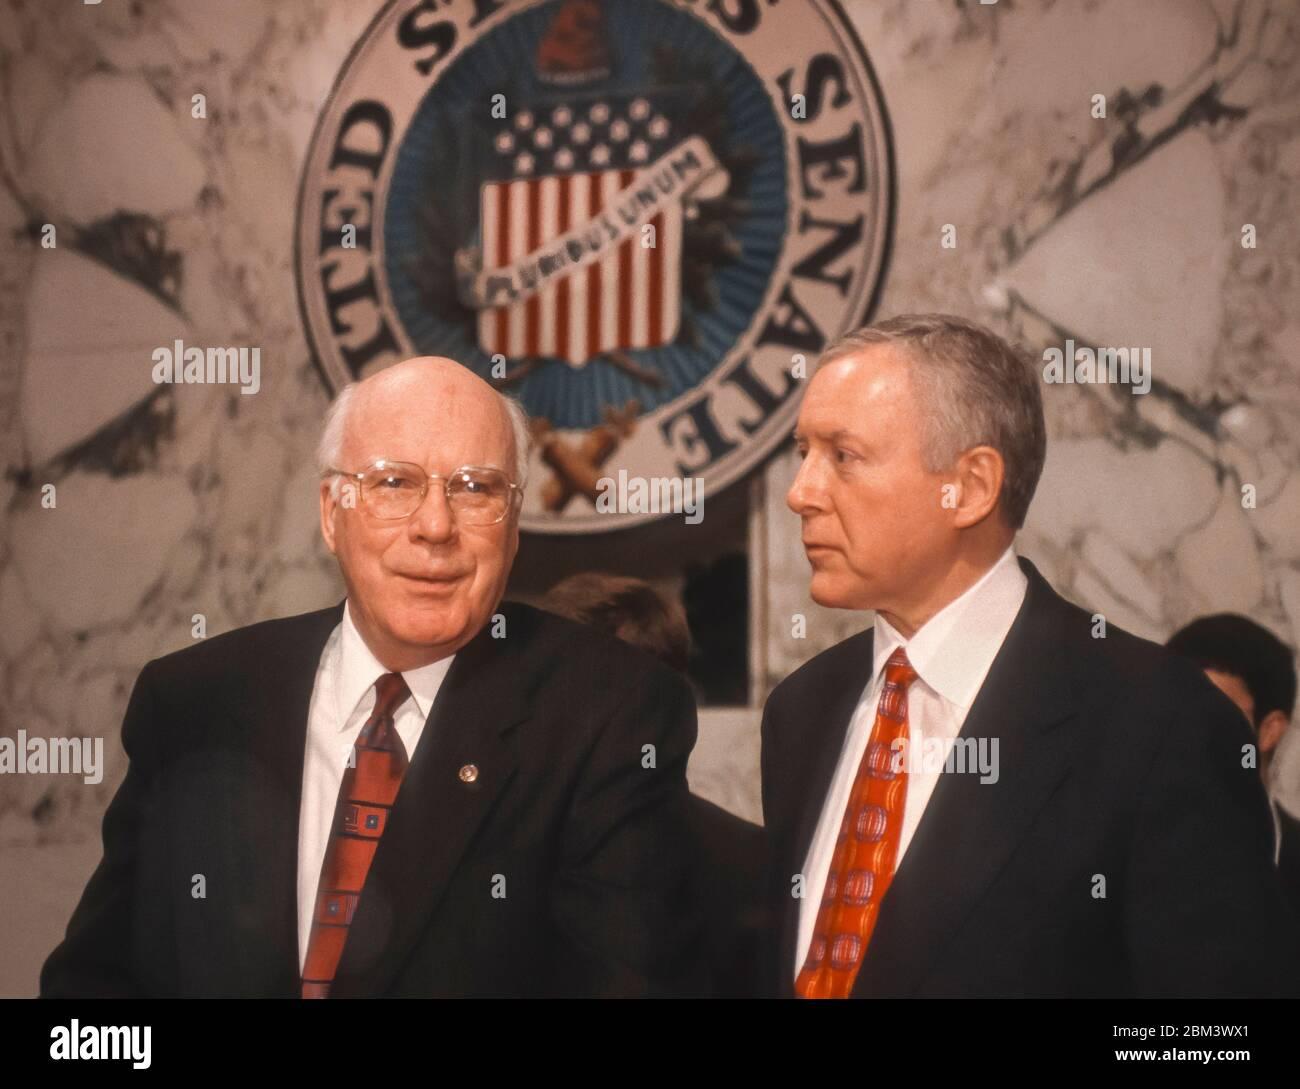 WASHINGTON, DC, USA, MARCH 3, 1998 - U.S. Senators Patrick Leahy (D-VT) left, and Orrin Hatch (R-UT) in Hart Senate Office building hearing room. Stock Photo